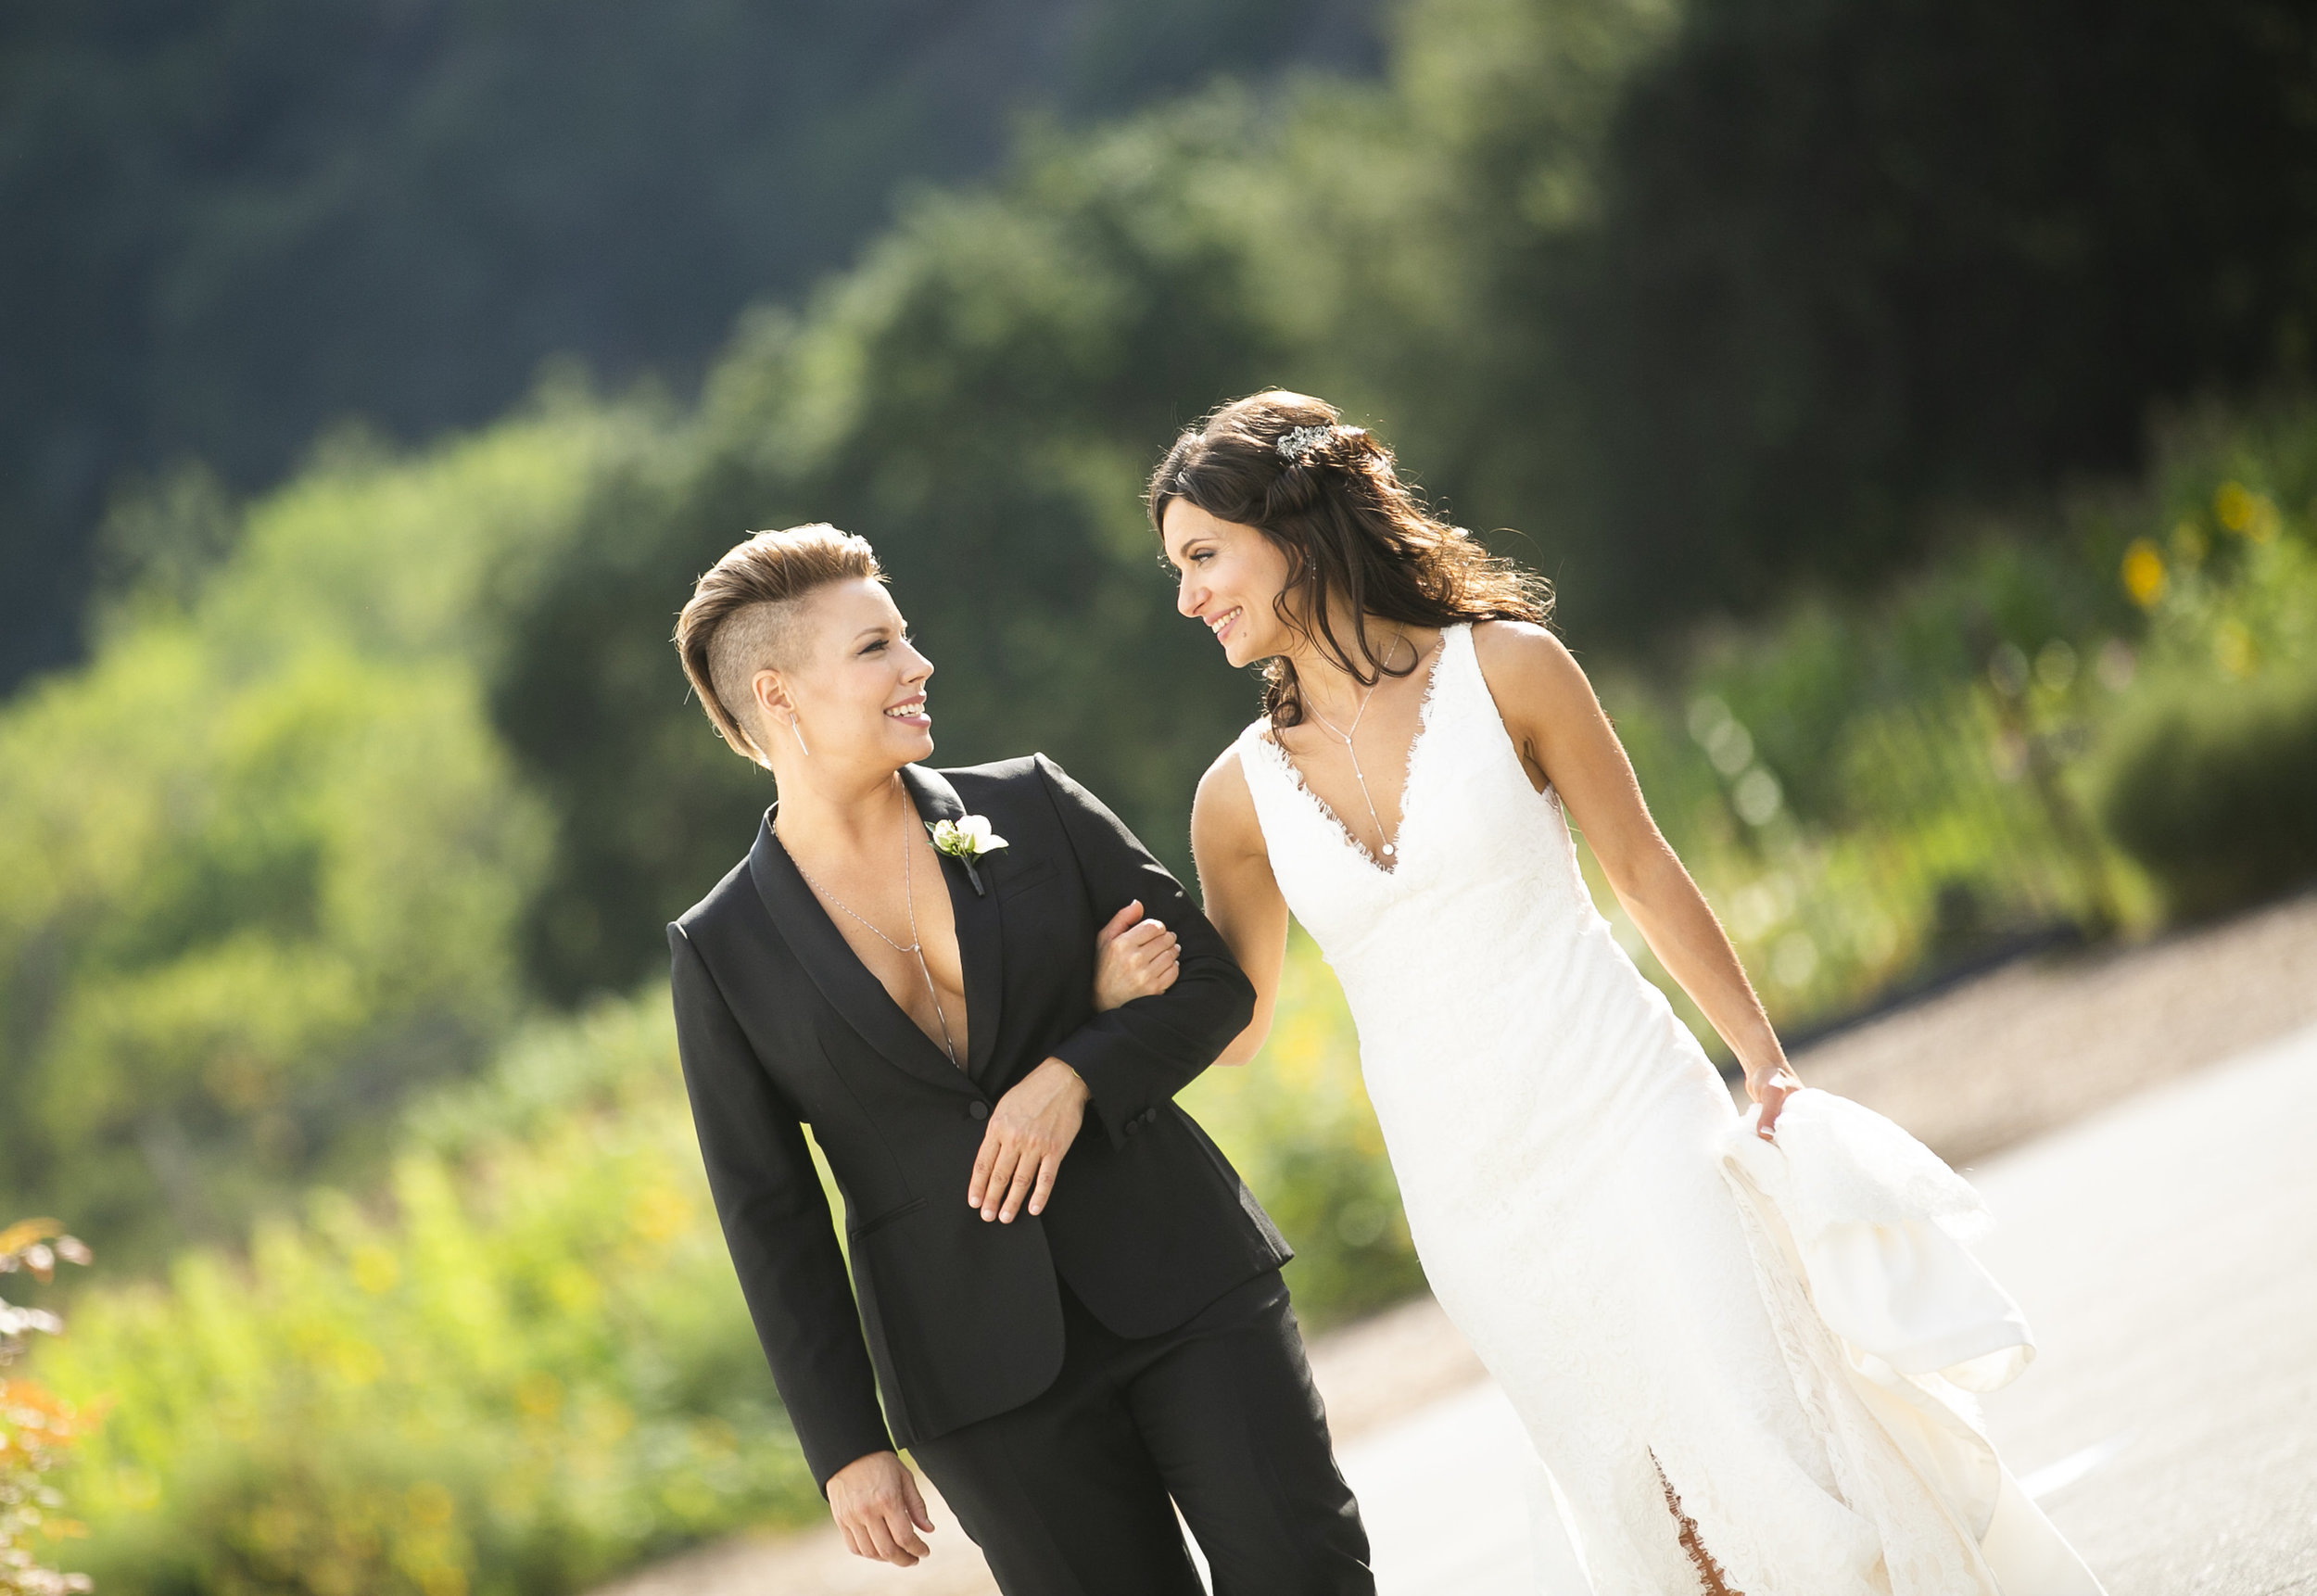 marialee_makeup_gay_wedding_gina&jess_2.JPG